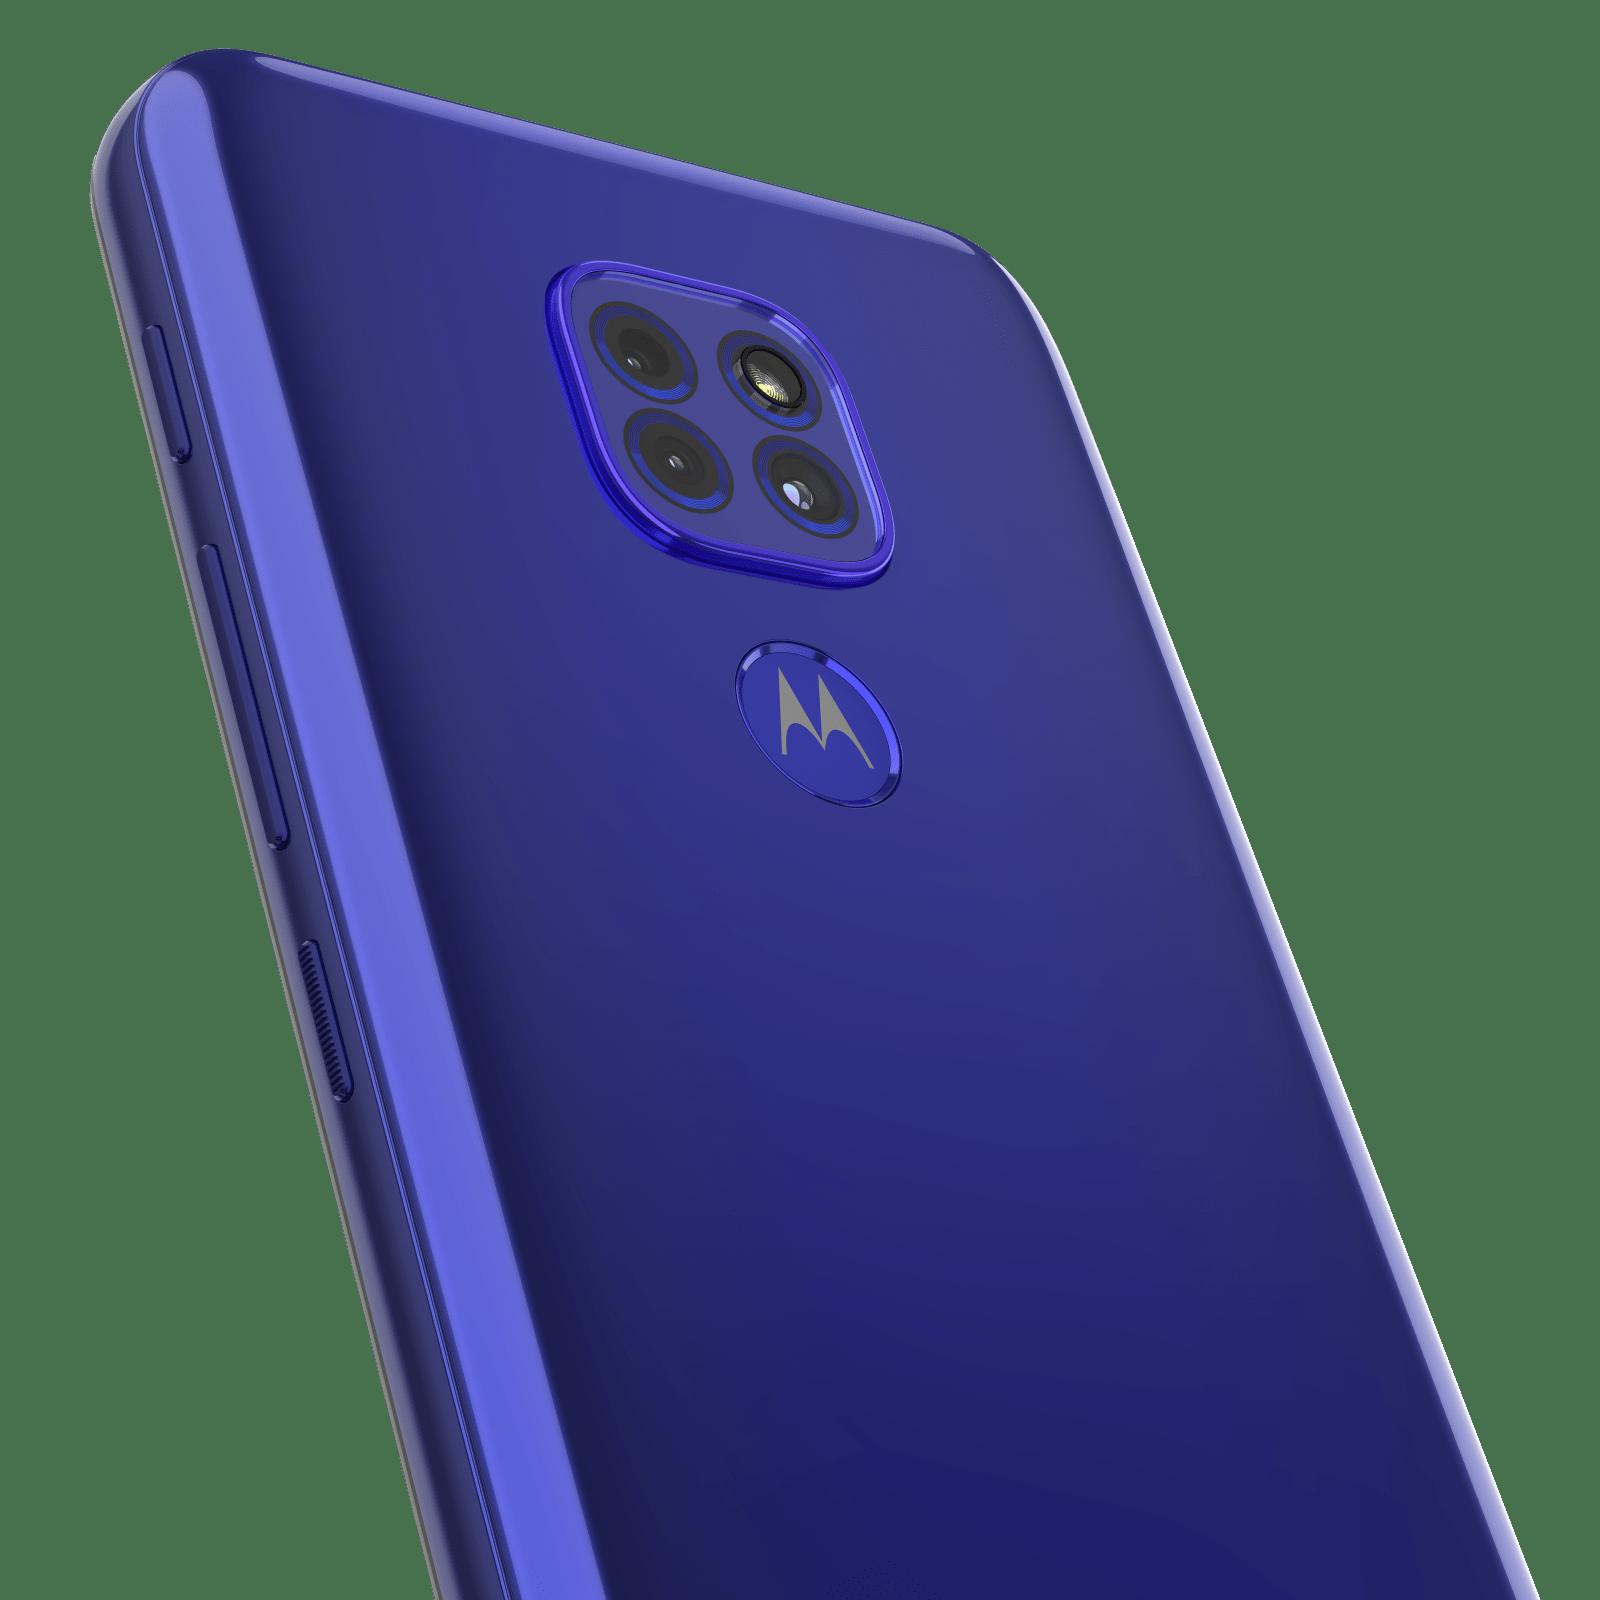 Motorola анонсирует старт продаж и российские цены смартфона moto g9 play (moto g9 play sapphire blue cam detail)